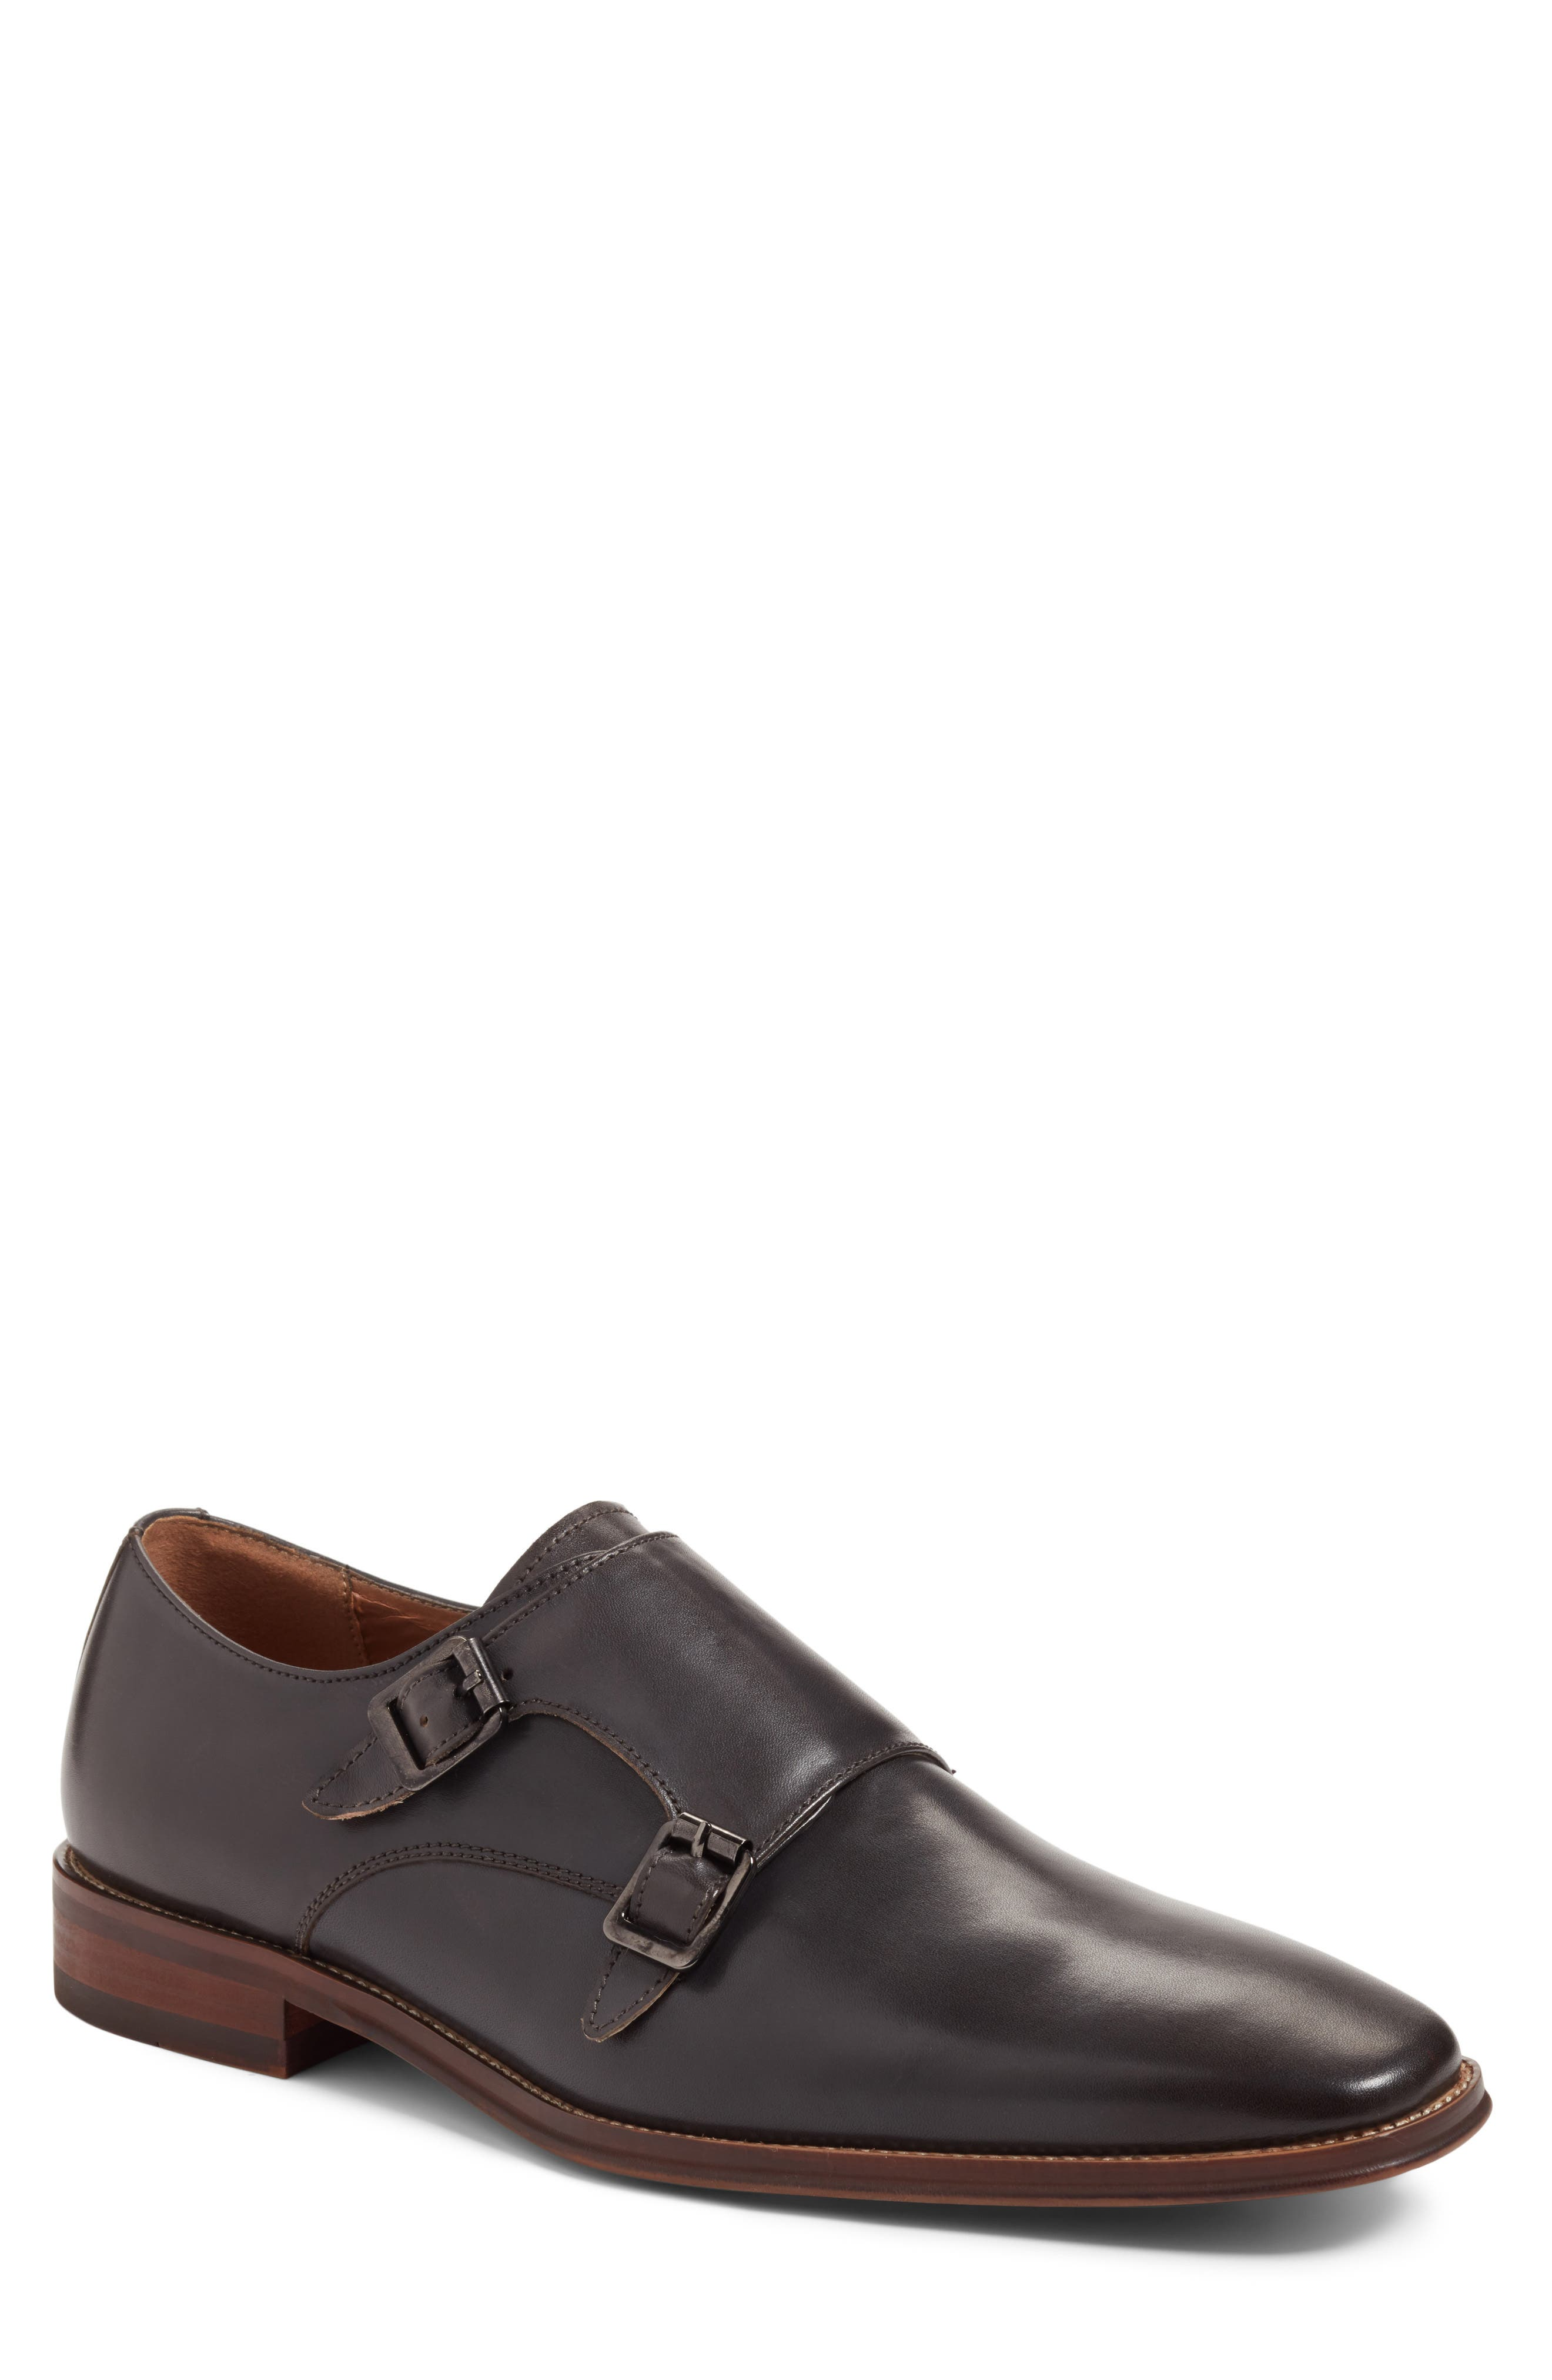 Sedona Double Strap Monk Shoe,                             Main thumbnail 1, color,                             Grey Leather